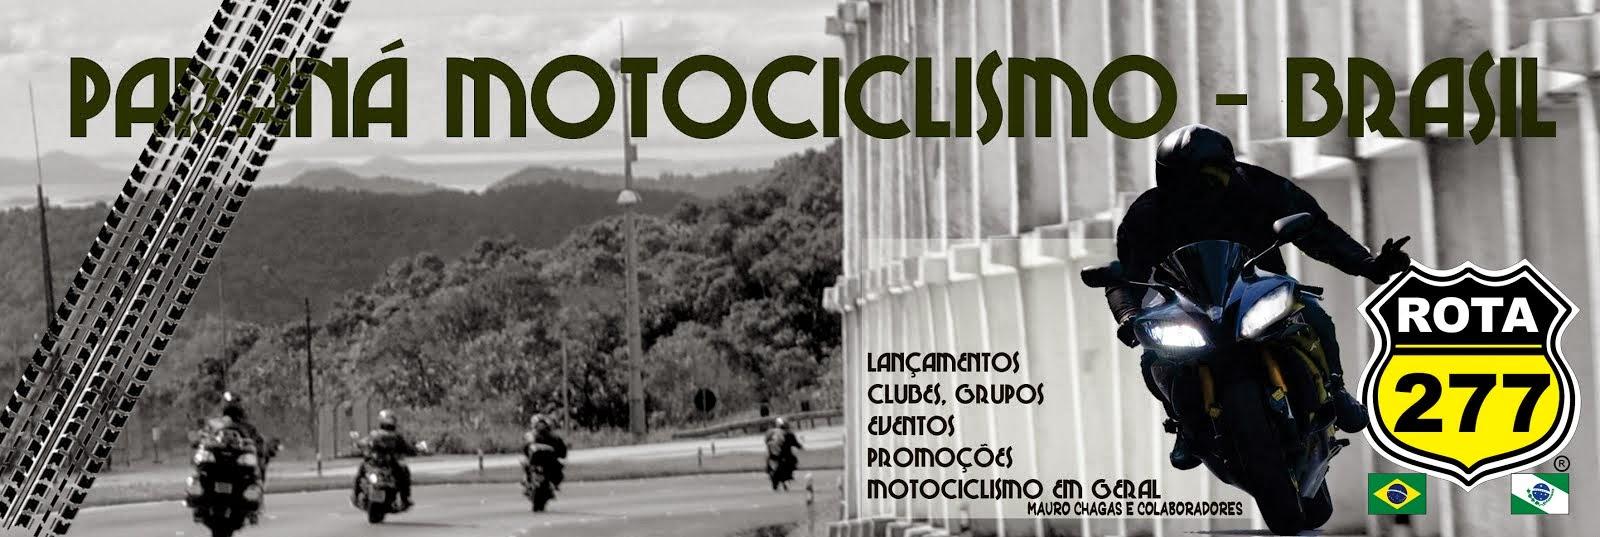 PARANAMOTOCICLISMO - CWB - PR - BR